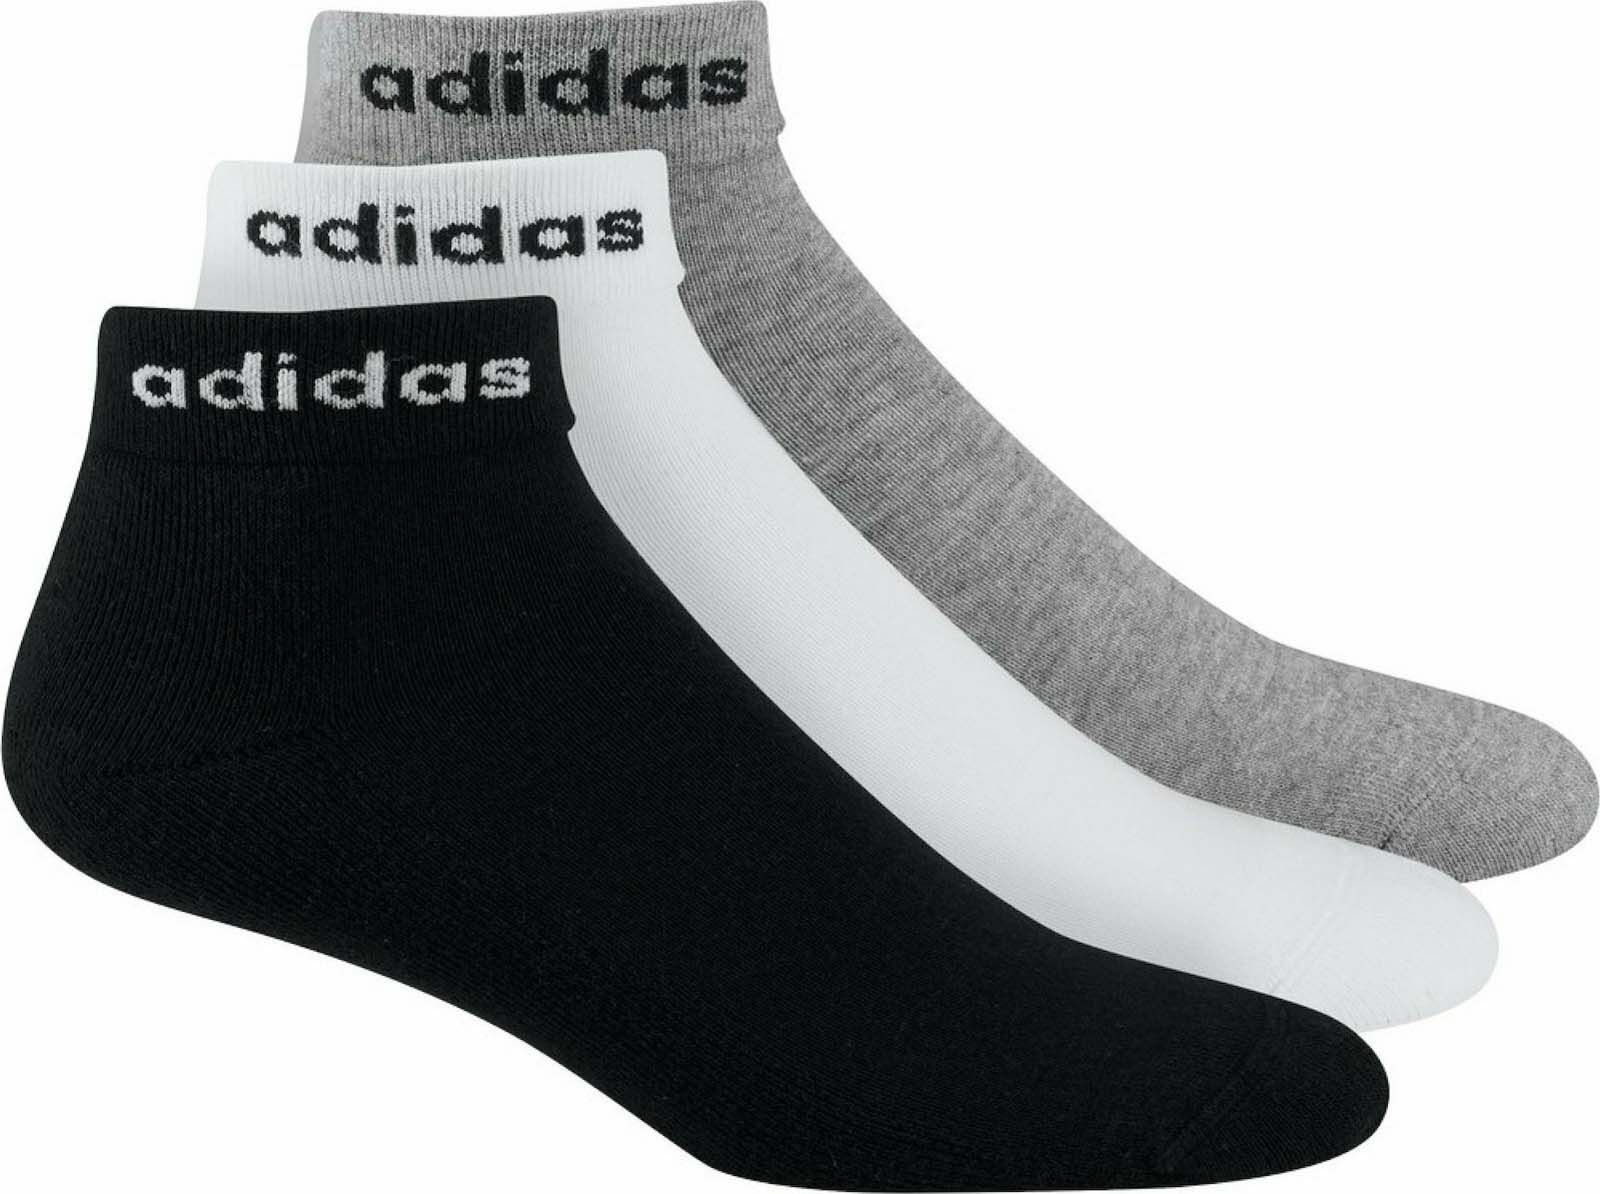 Набор носков унисекс Adidas HC ANKLE 3PP    MH черный L